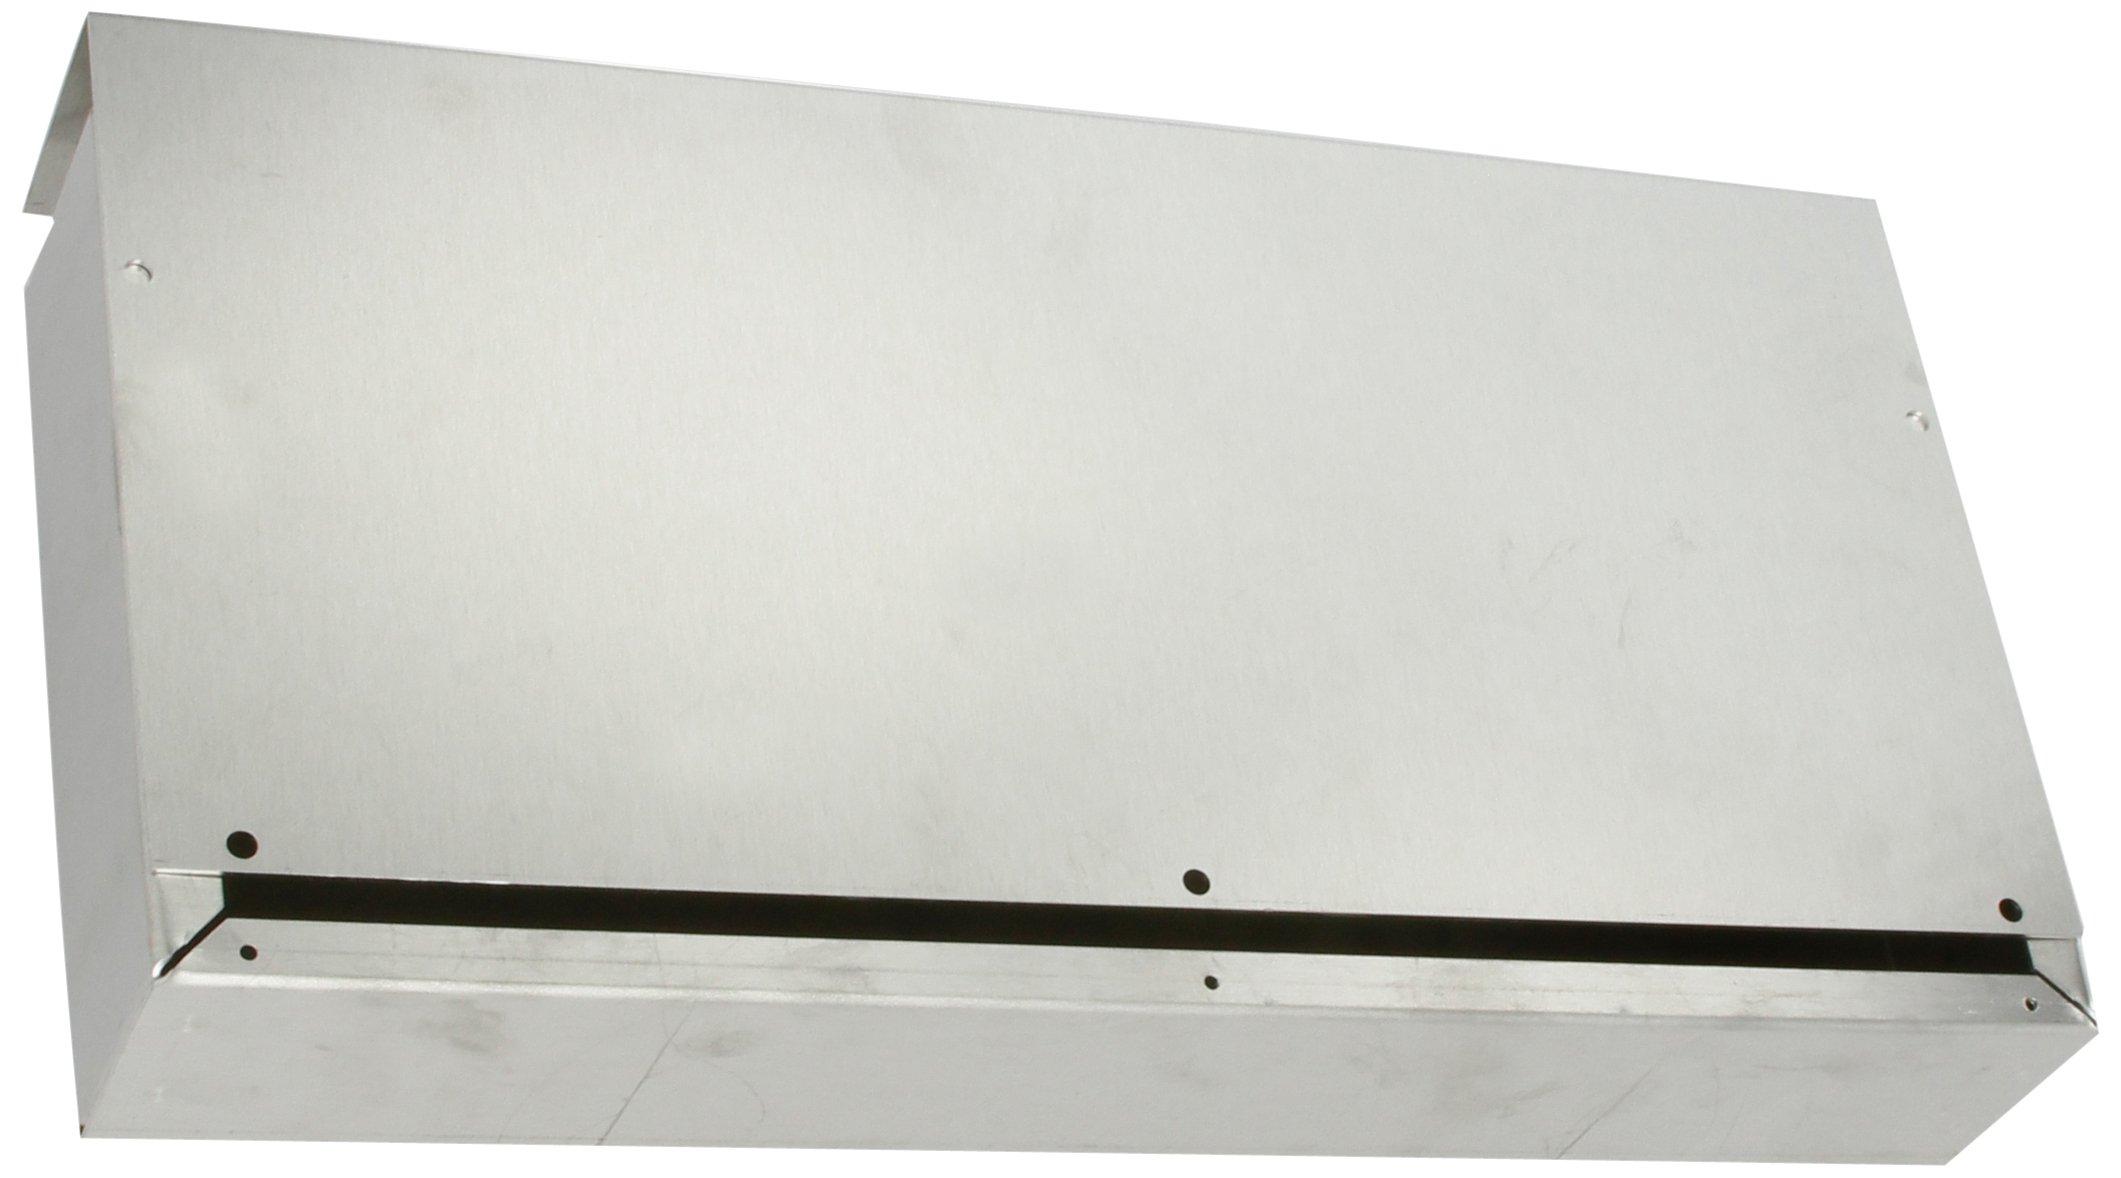 BUD Industries CU-712-A Aluminum Converter Box, 15'' Width x 2-1/2 Height x 7'' Depth, Natural Finish